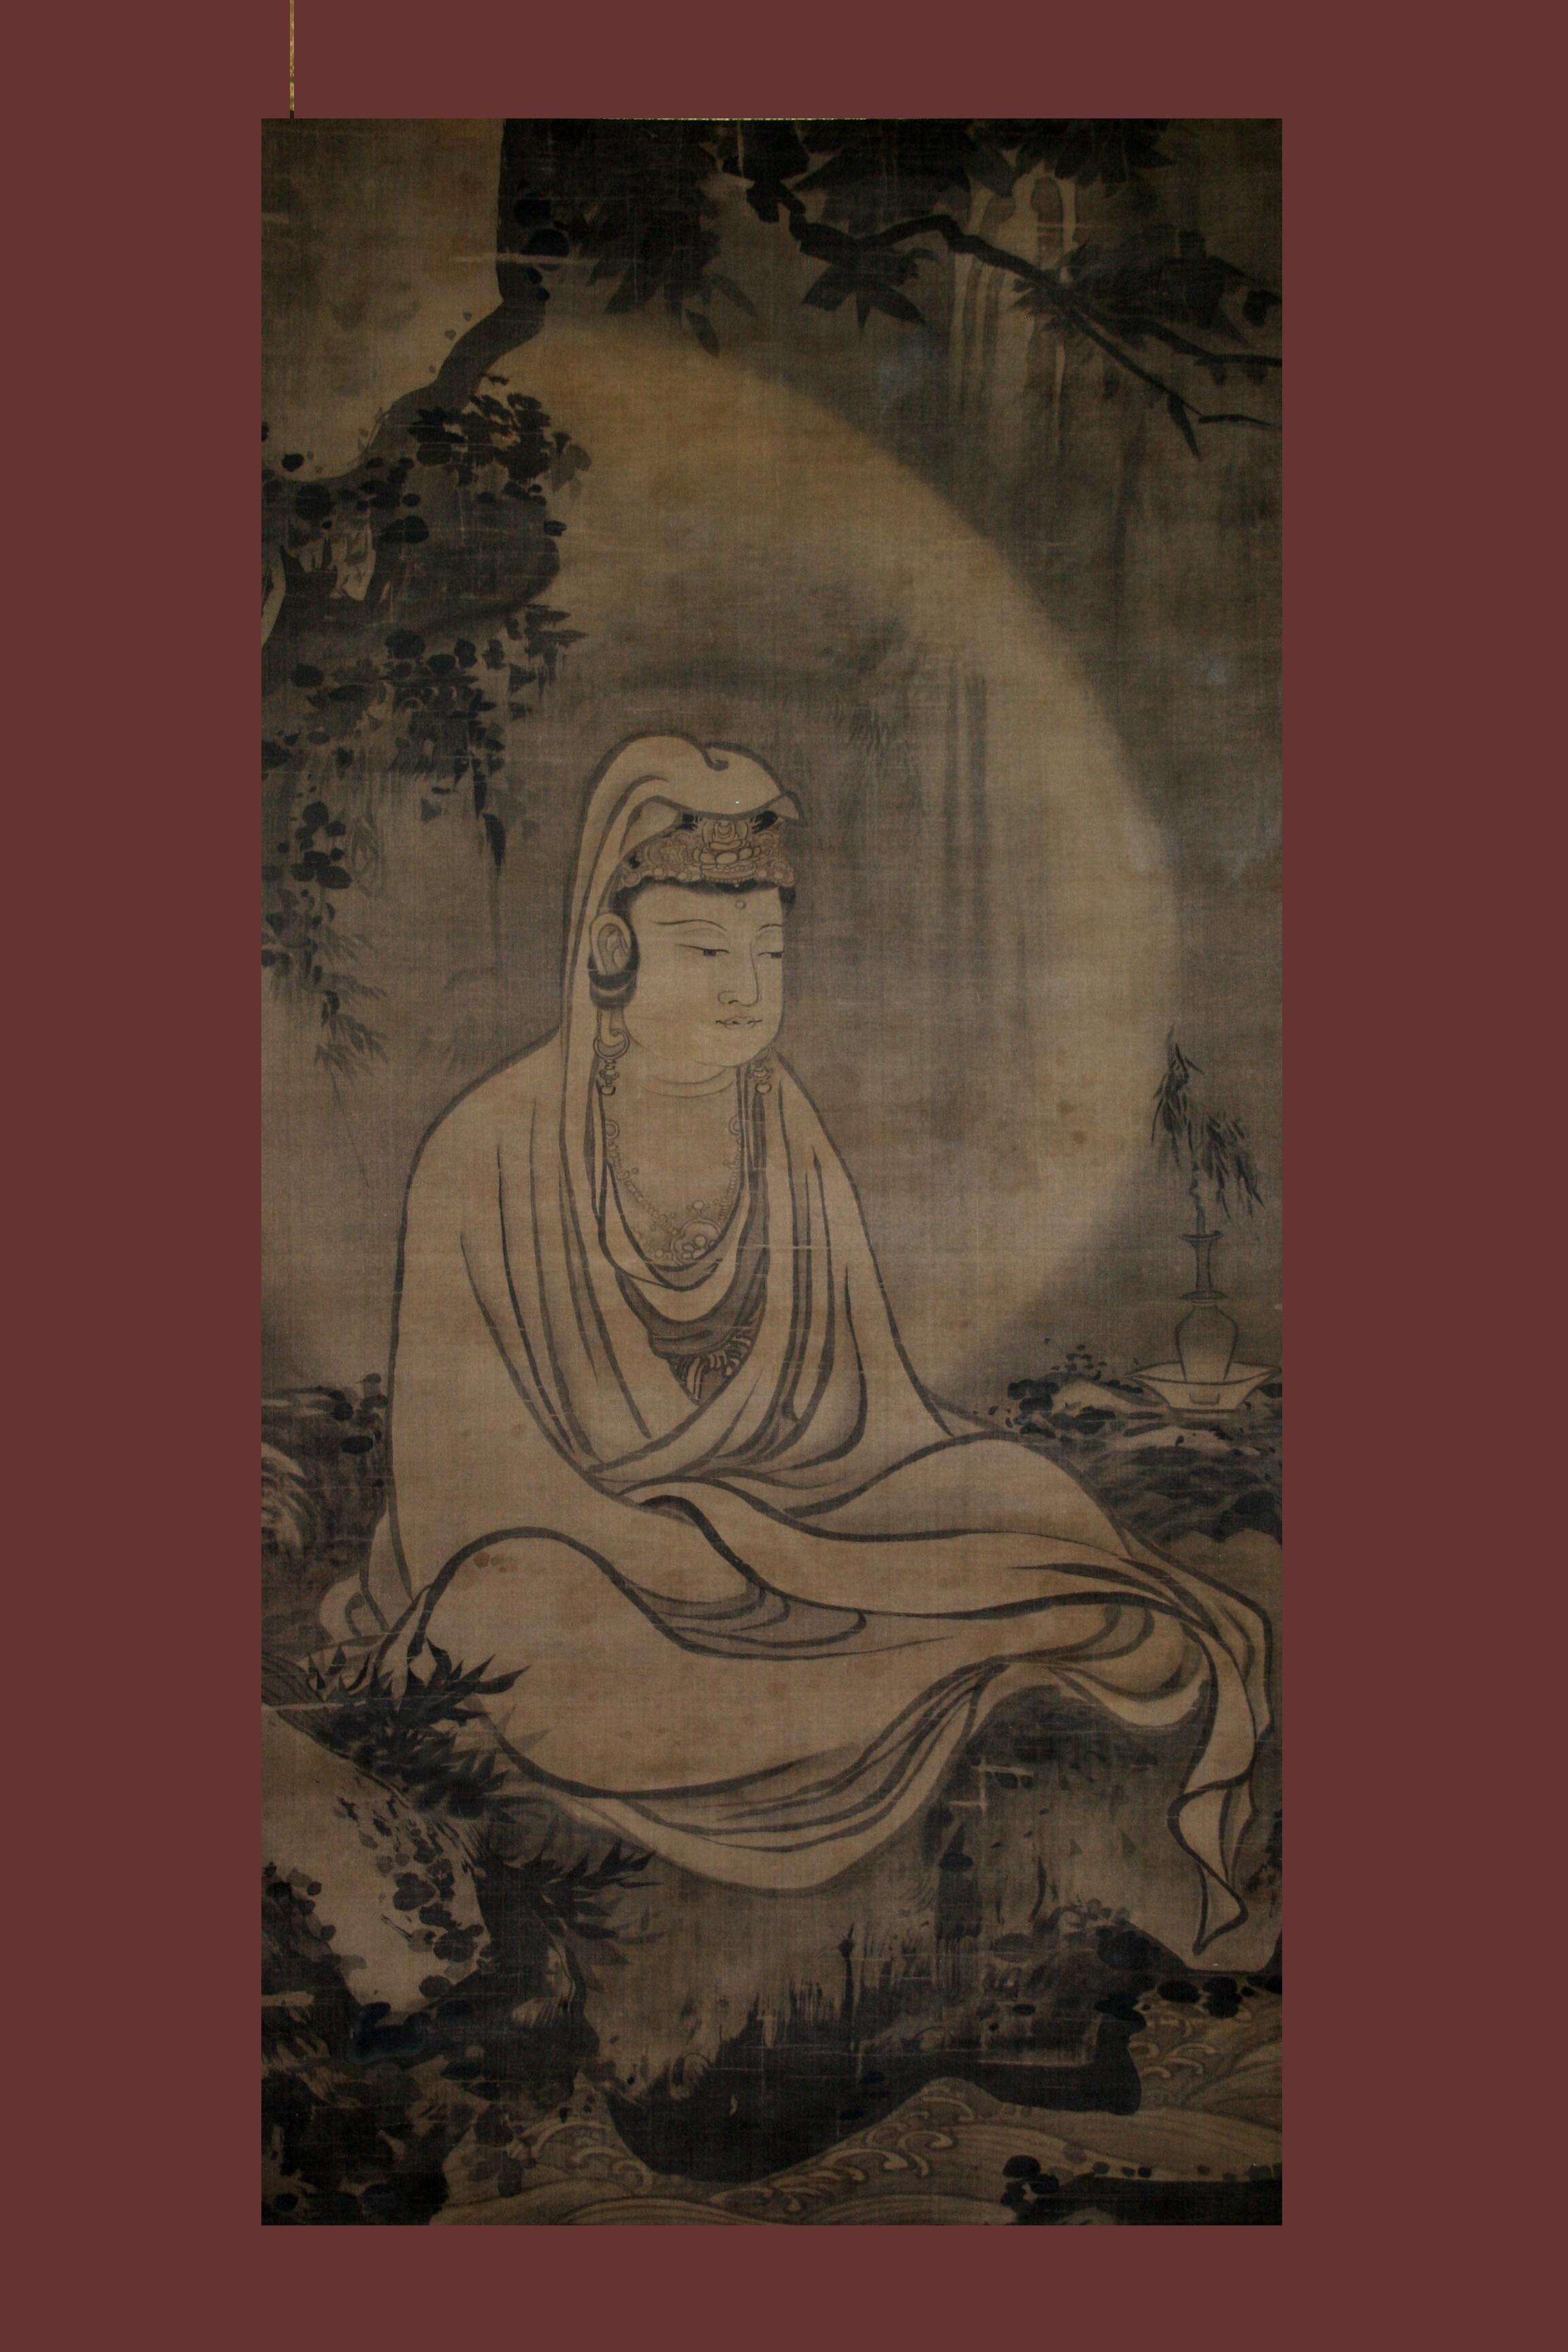 Guan Yin White Robe Painting